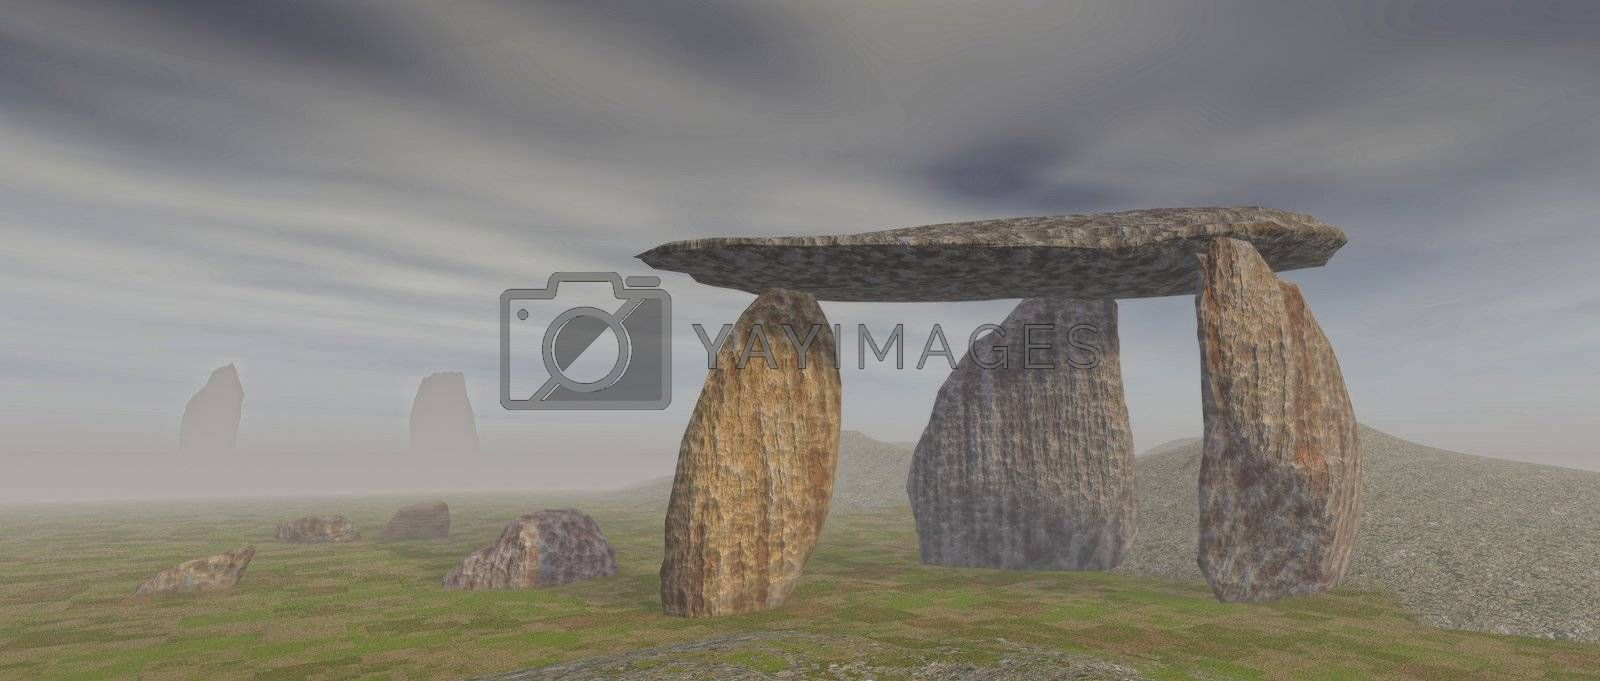 3D render of a dolmen landscape under a gray sky